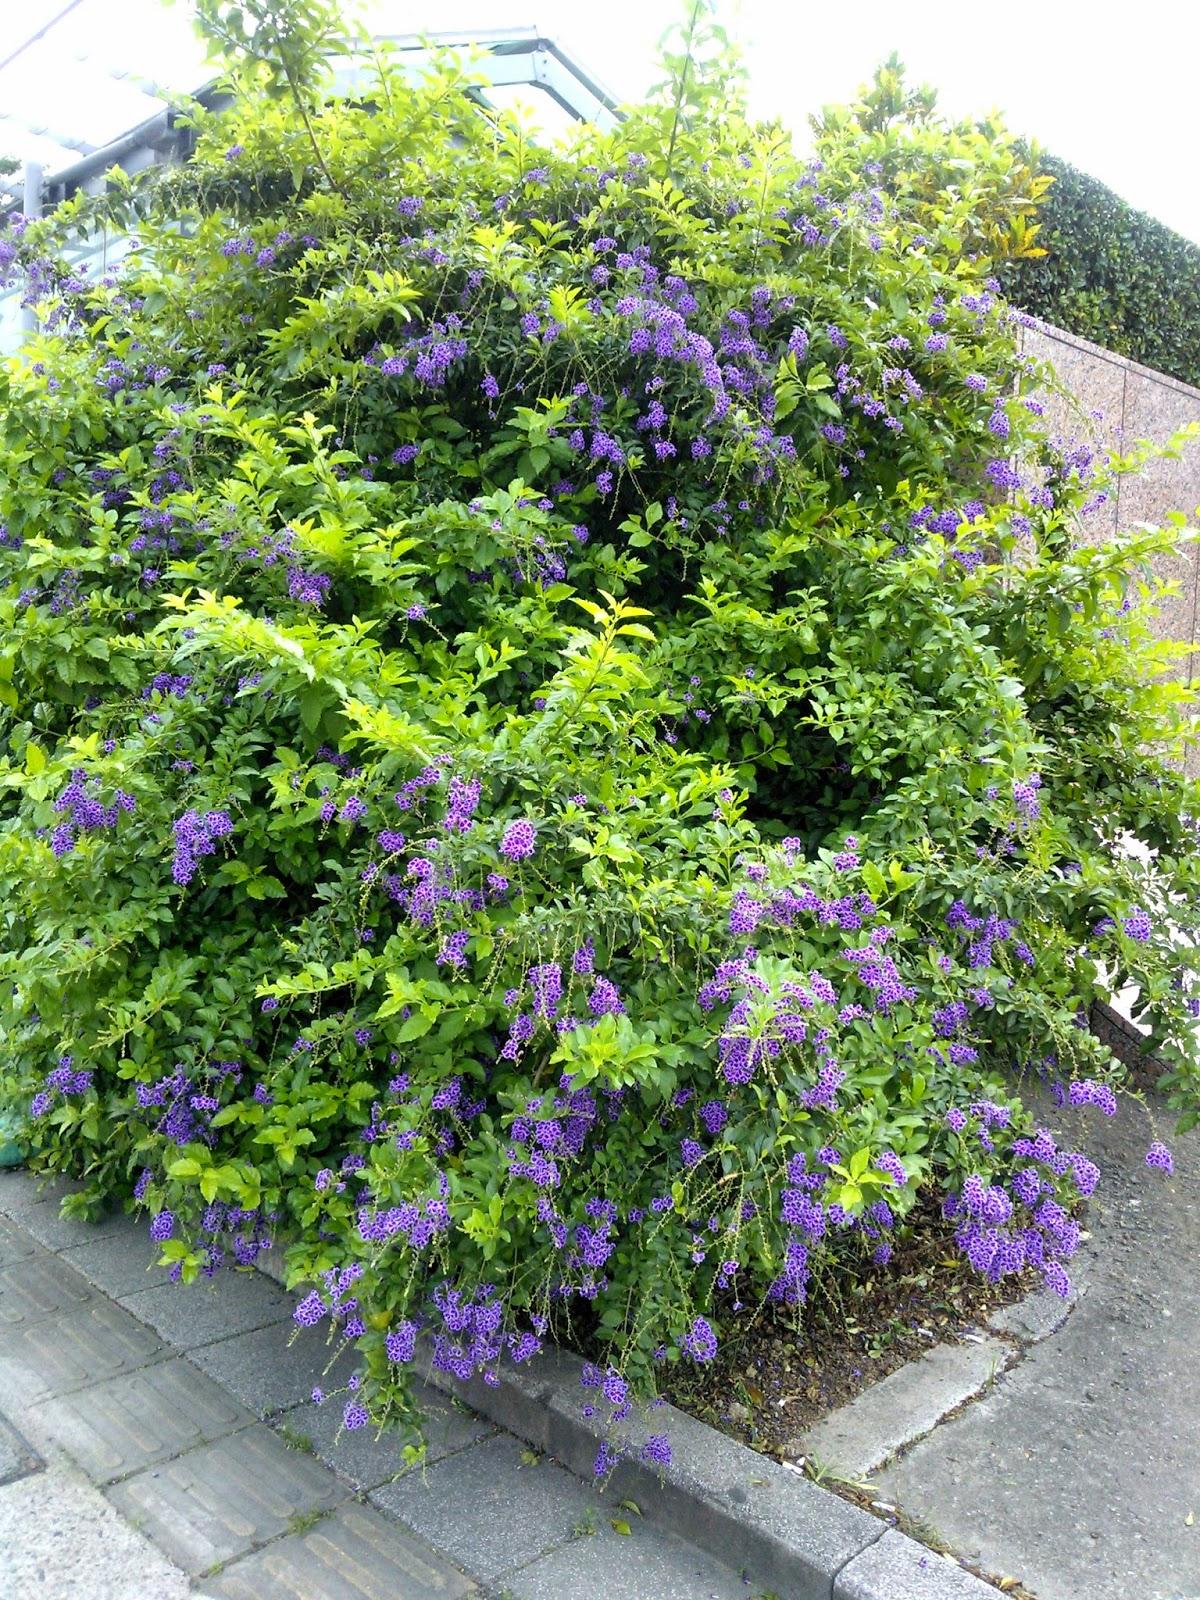 DWAN雲之端: 蕾絲金露花--英文名稱: Lace Golden Dewdrops,及後續貼合,主要從事紡織布料之生產與加工,希臘語詩人莎芙在這個島上舉行女詩人同歡會, Purple Skyflowe 學 名: Duranta repens cv. 'Lass' Duranta repens cv. 'Purple' . 別 名: 蕾絲邊金露花 原產地: 栽培種。 分布: 園藝栽培 ,Purple Skyflower.;有別於金露花 ...